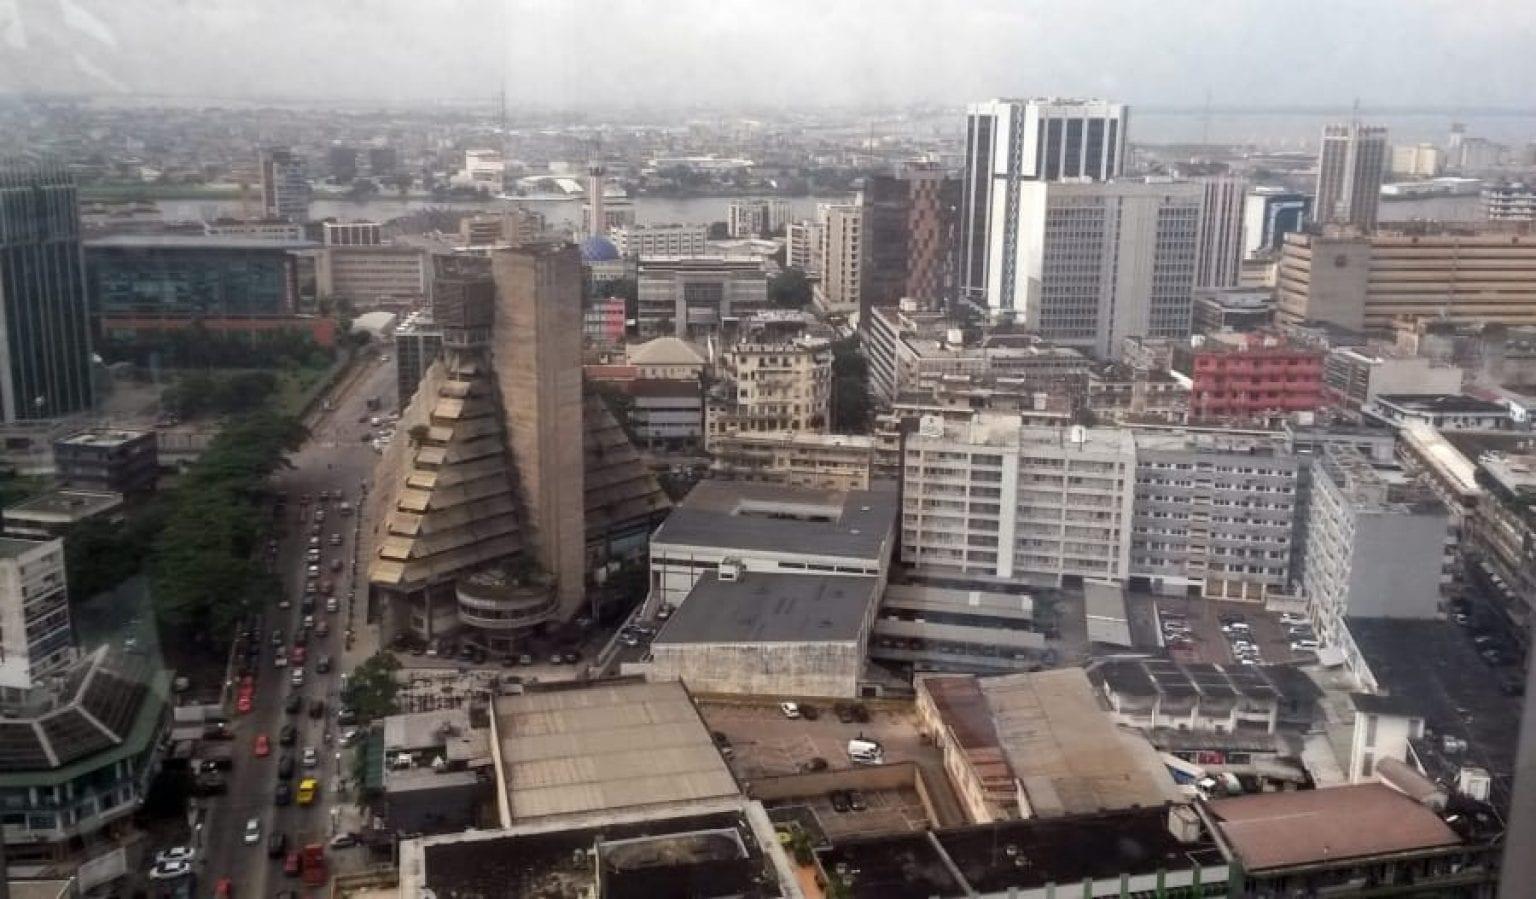 Coronavirus – Abidjan s'isole du monde ce 30 mars 2020 : à quand le corridor humanitaire ?